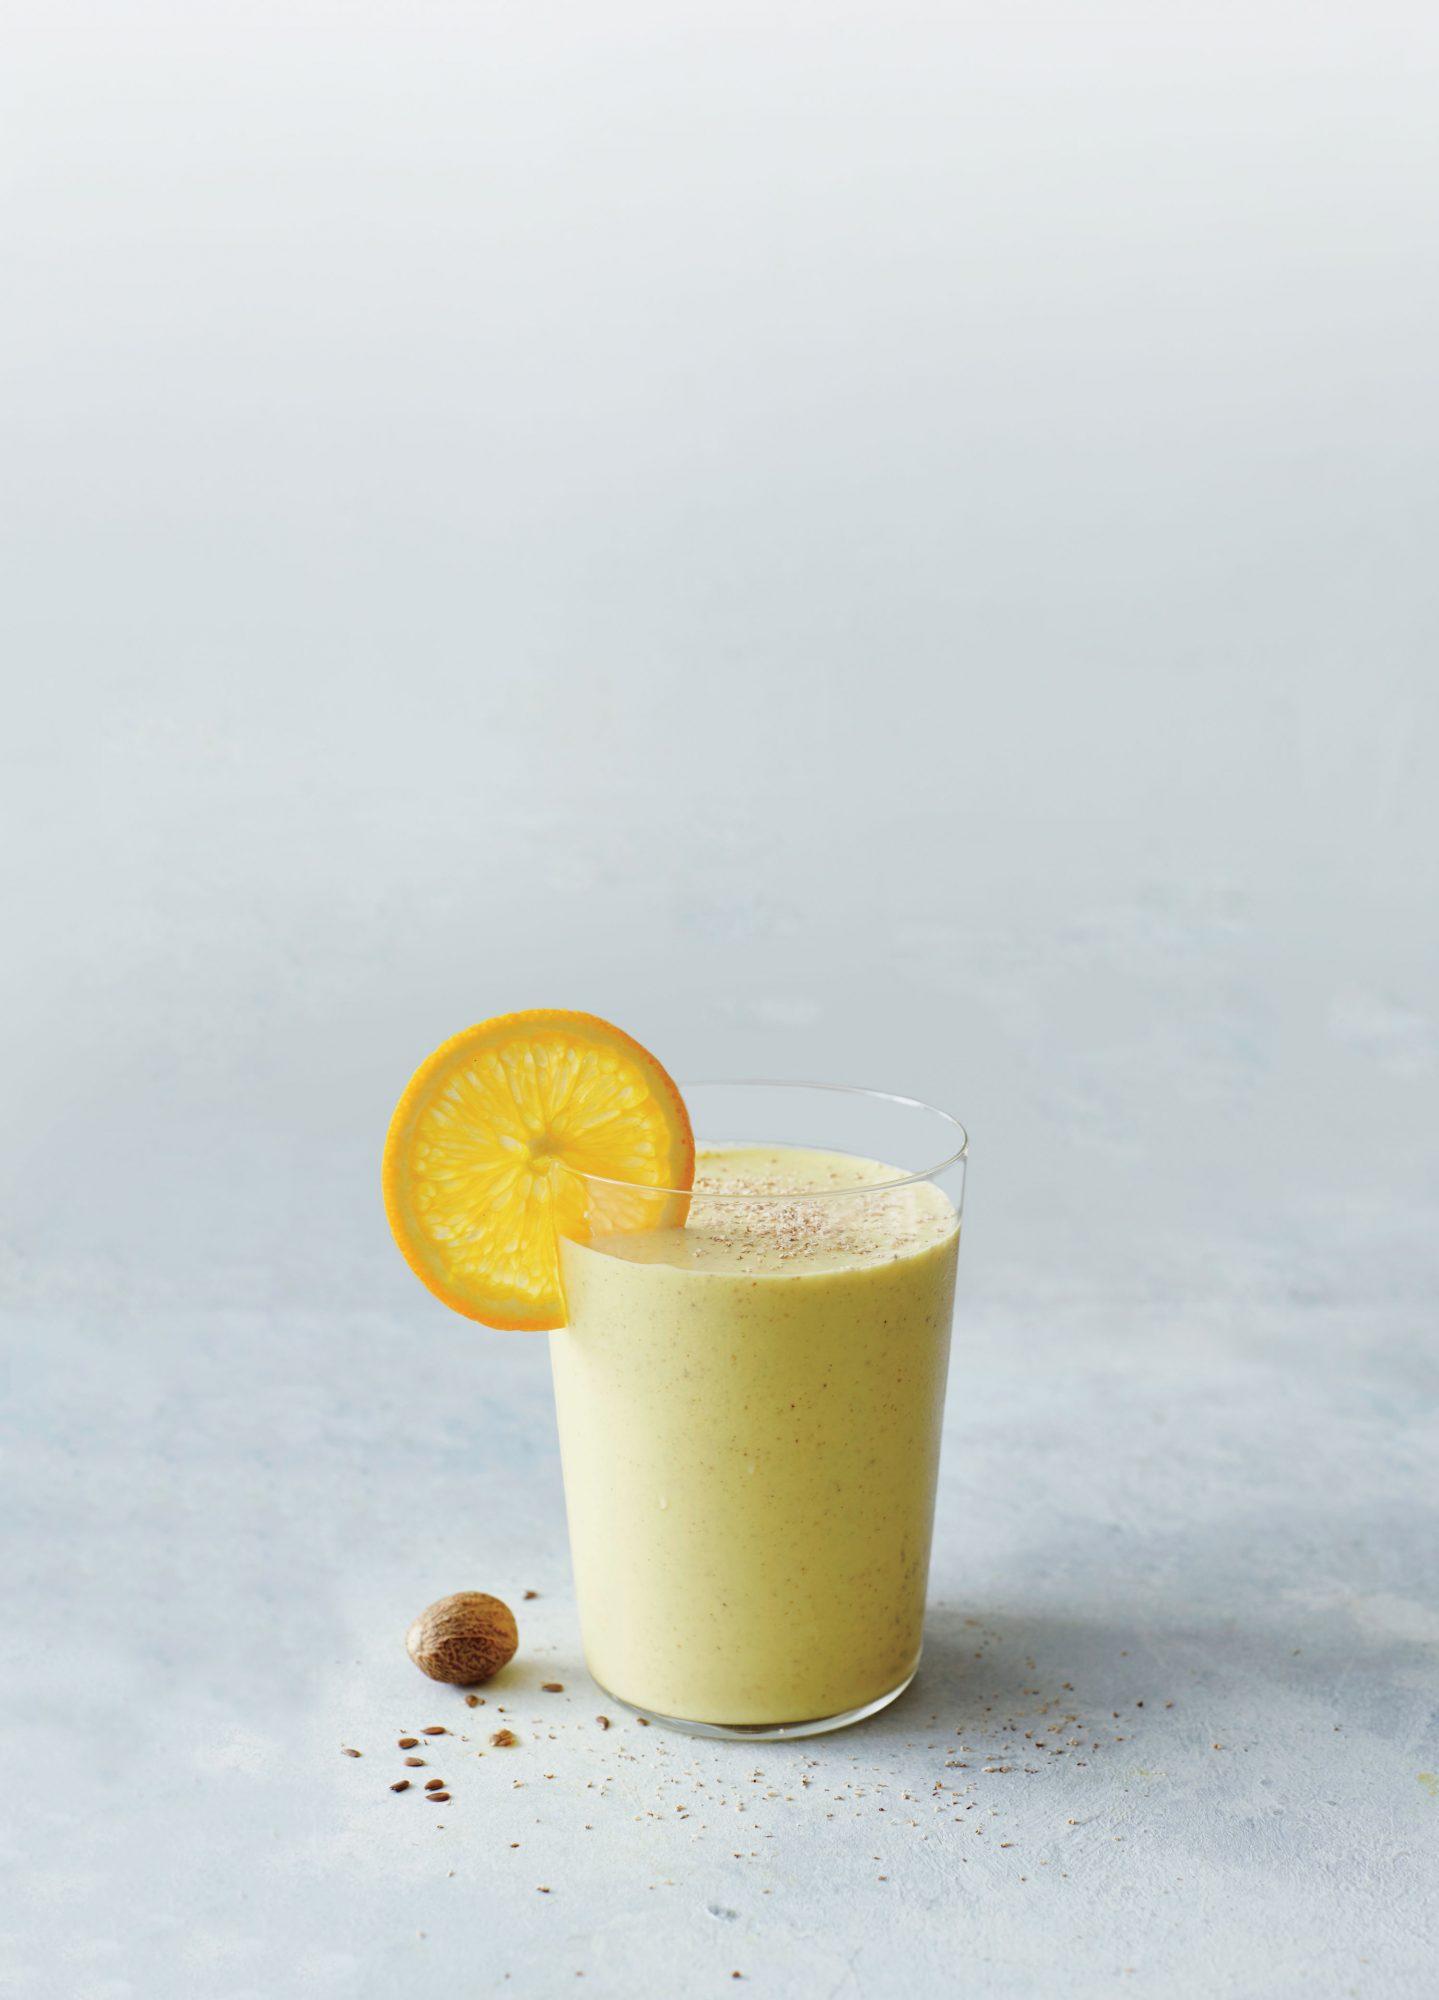 Orange-Mango Gritty with Turmeric and Walnuts